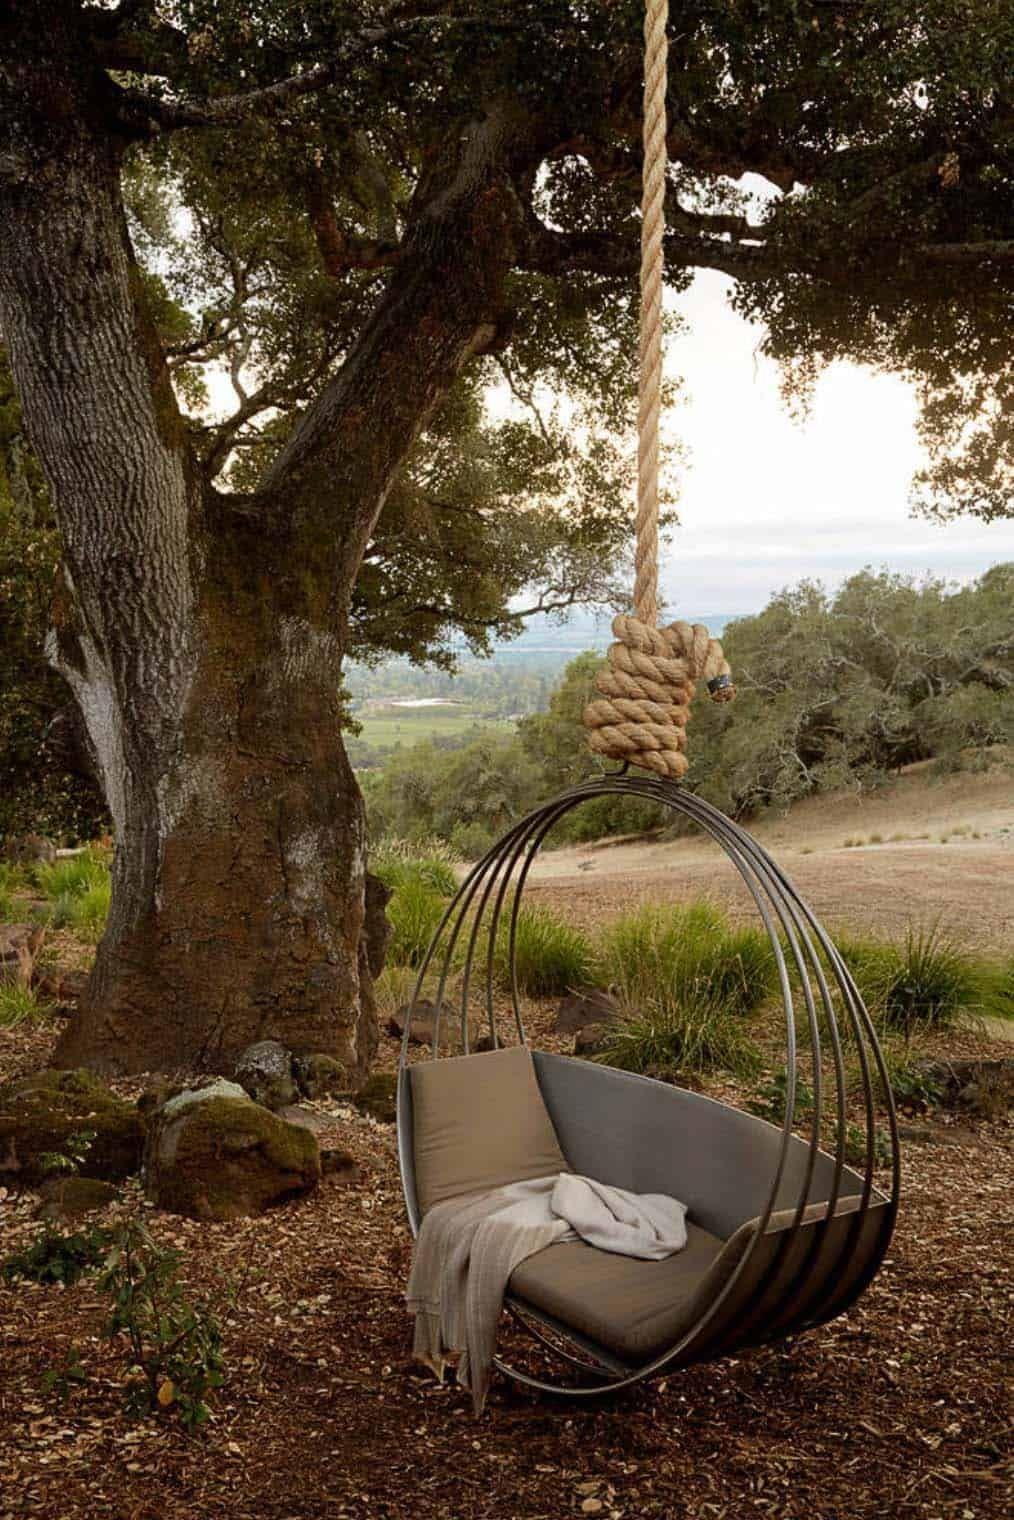 27 Absolutely fabulous outdoor swing beds for summertime enjoyment – https://pickndecor.com/interior